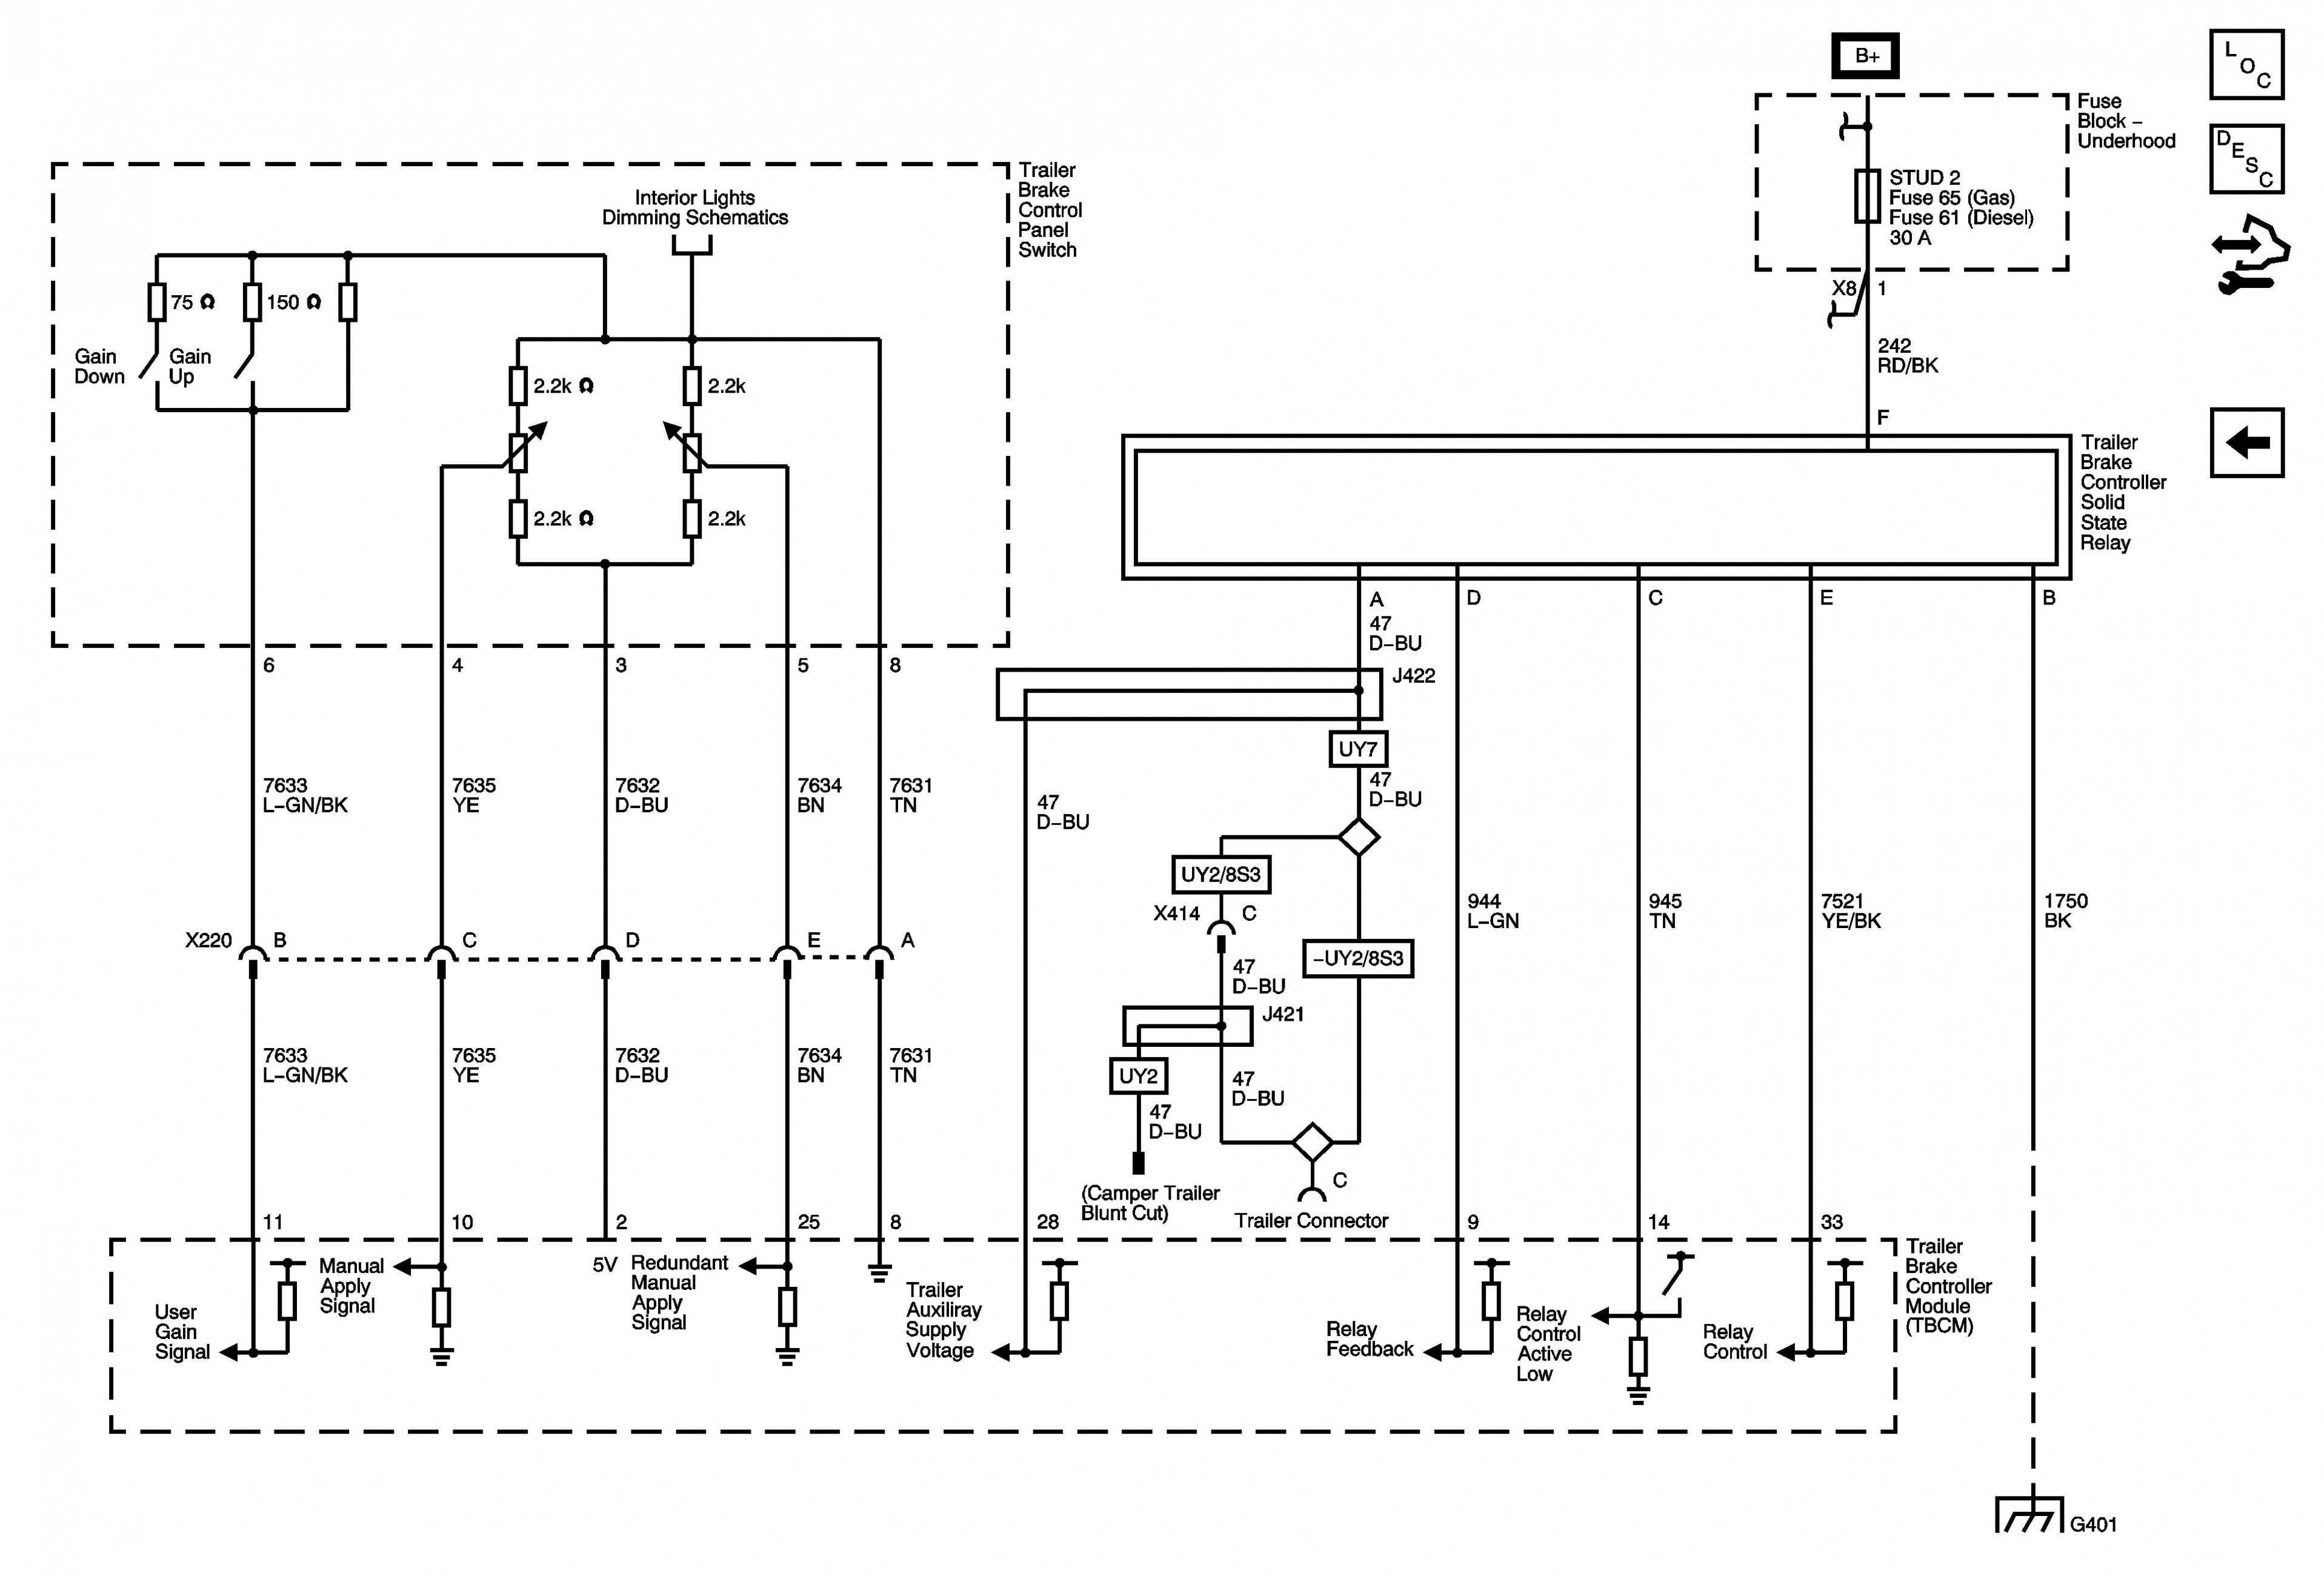 30 Amp Twist Lock Plug Wiring Diagram 20 Amp Twist Lock Plug Wiring Diagram List Wiring Diagram 16 Amp Of 30 Amp Twist Lock Plug Wiring Diagram